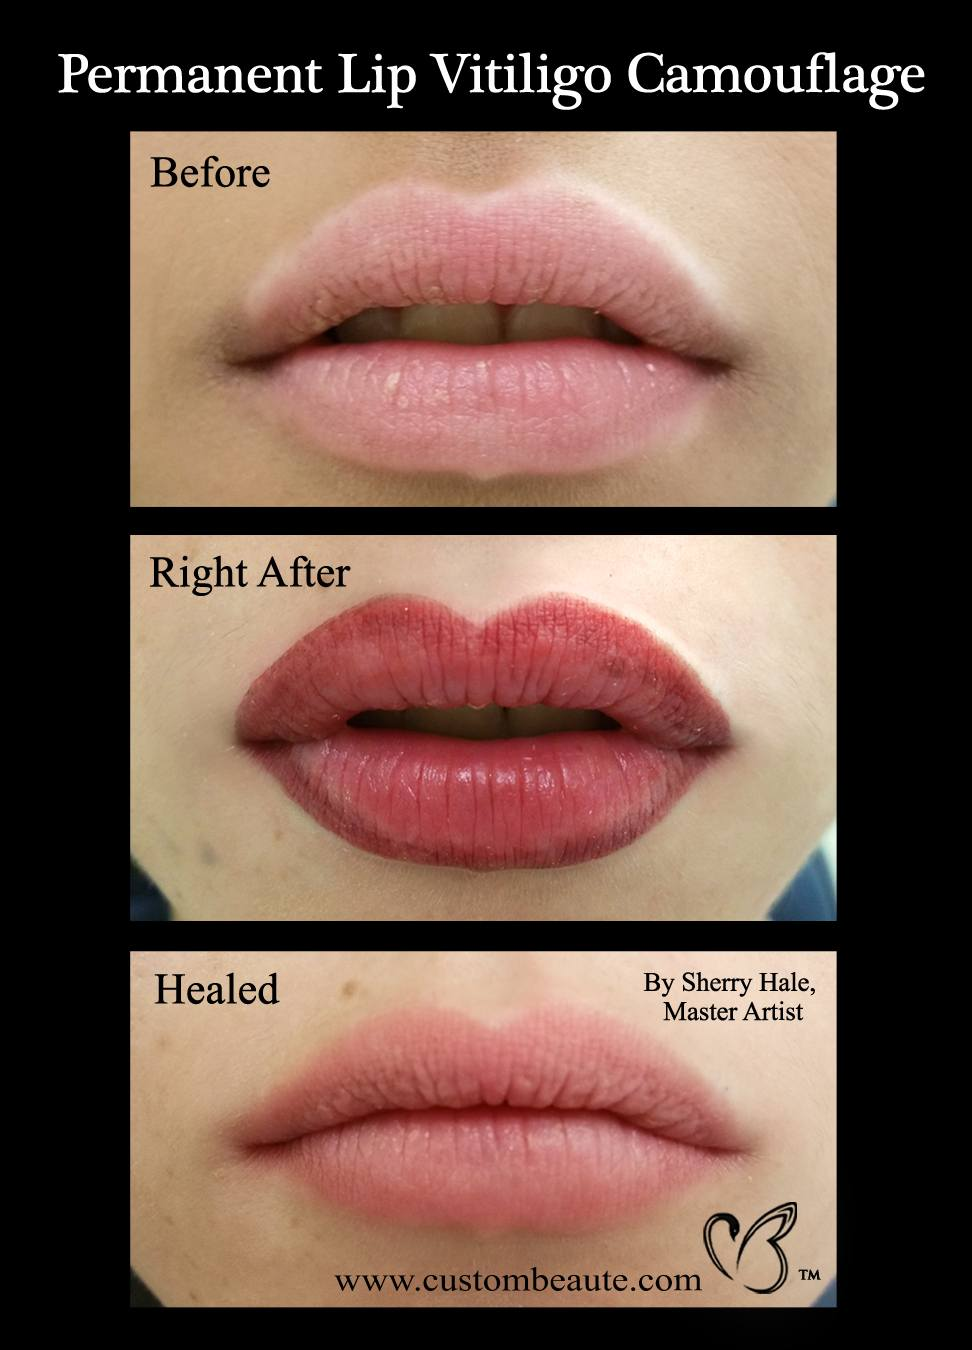 Permanent Lip Vitiligo Camouflage - Microblading